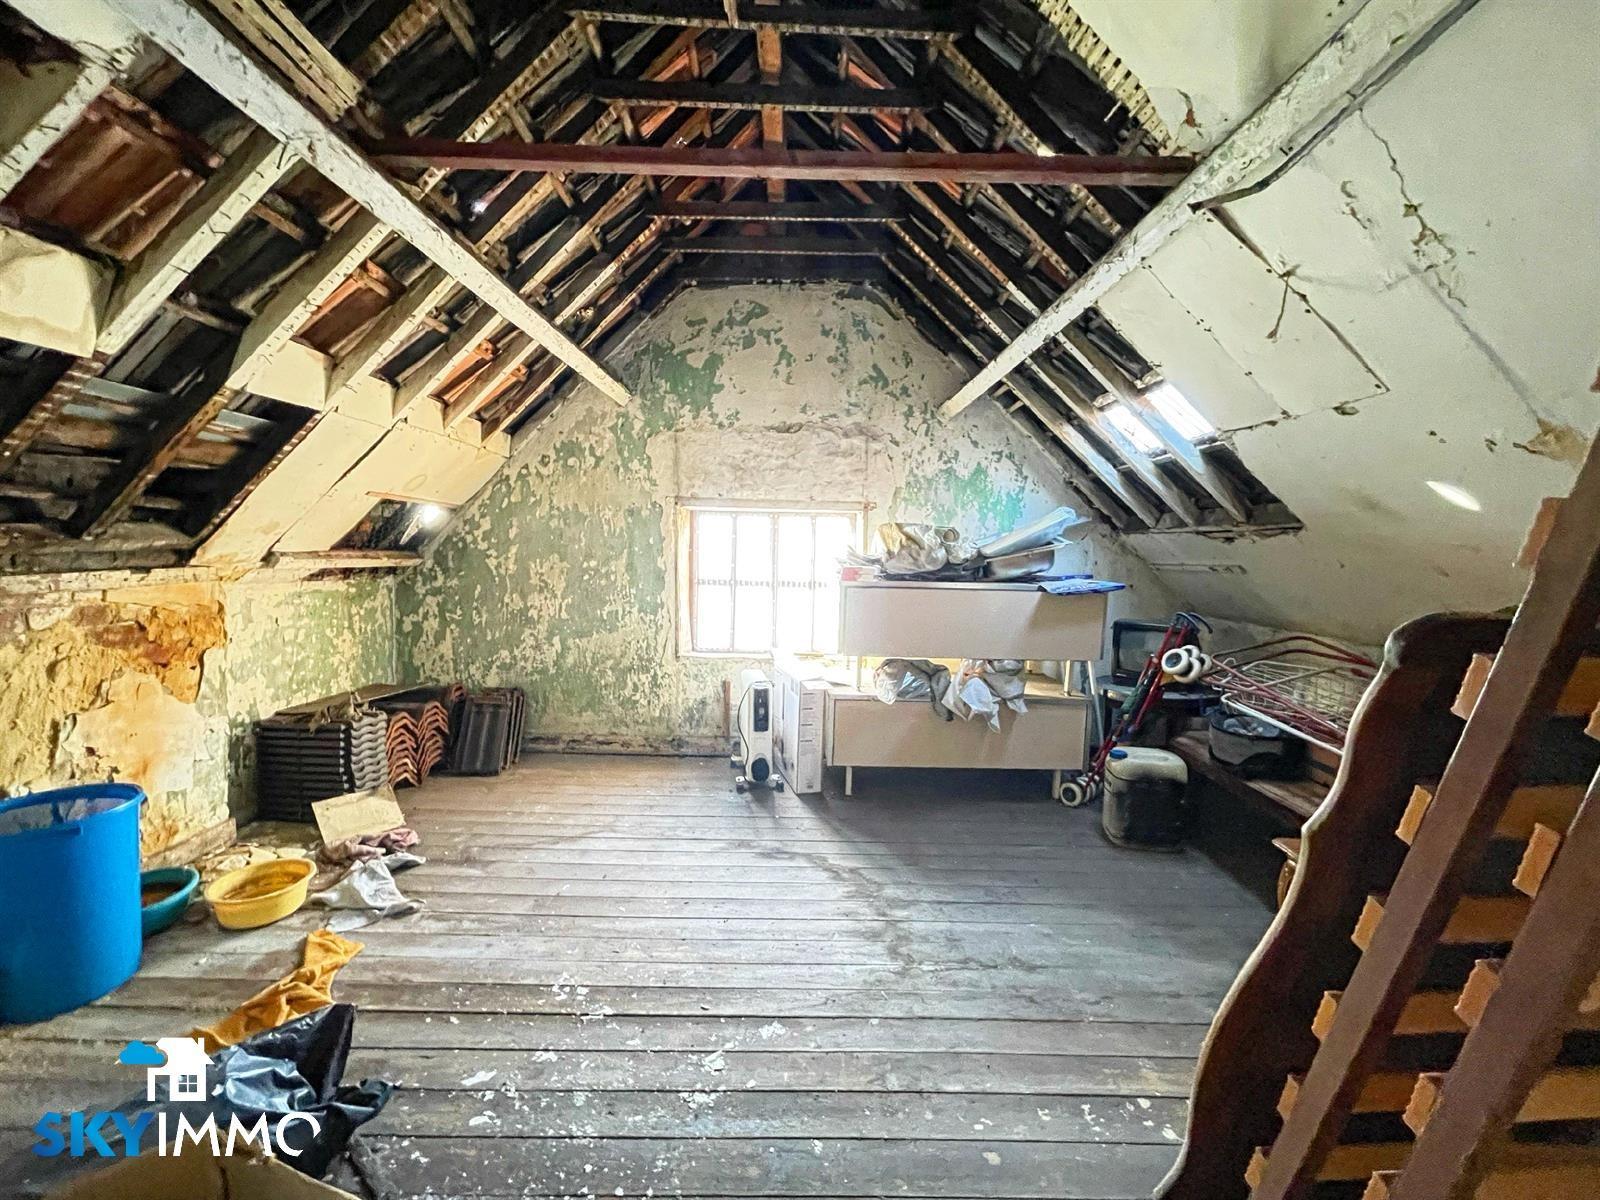 Maison - Seraing Jemeppesur-Meuse - #4383857-19